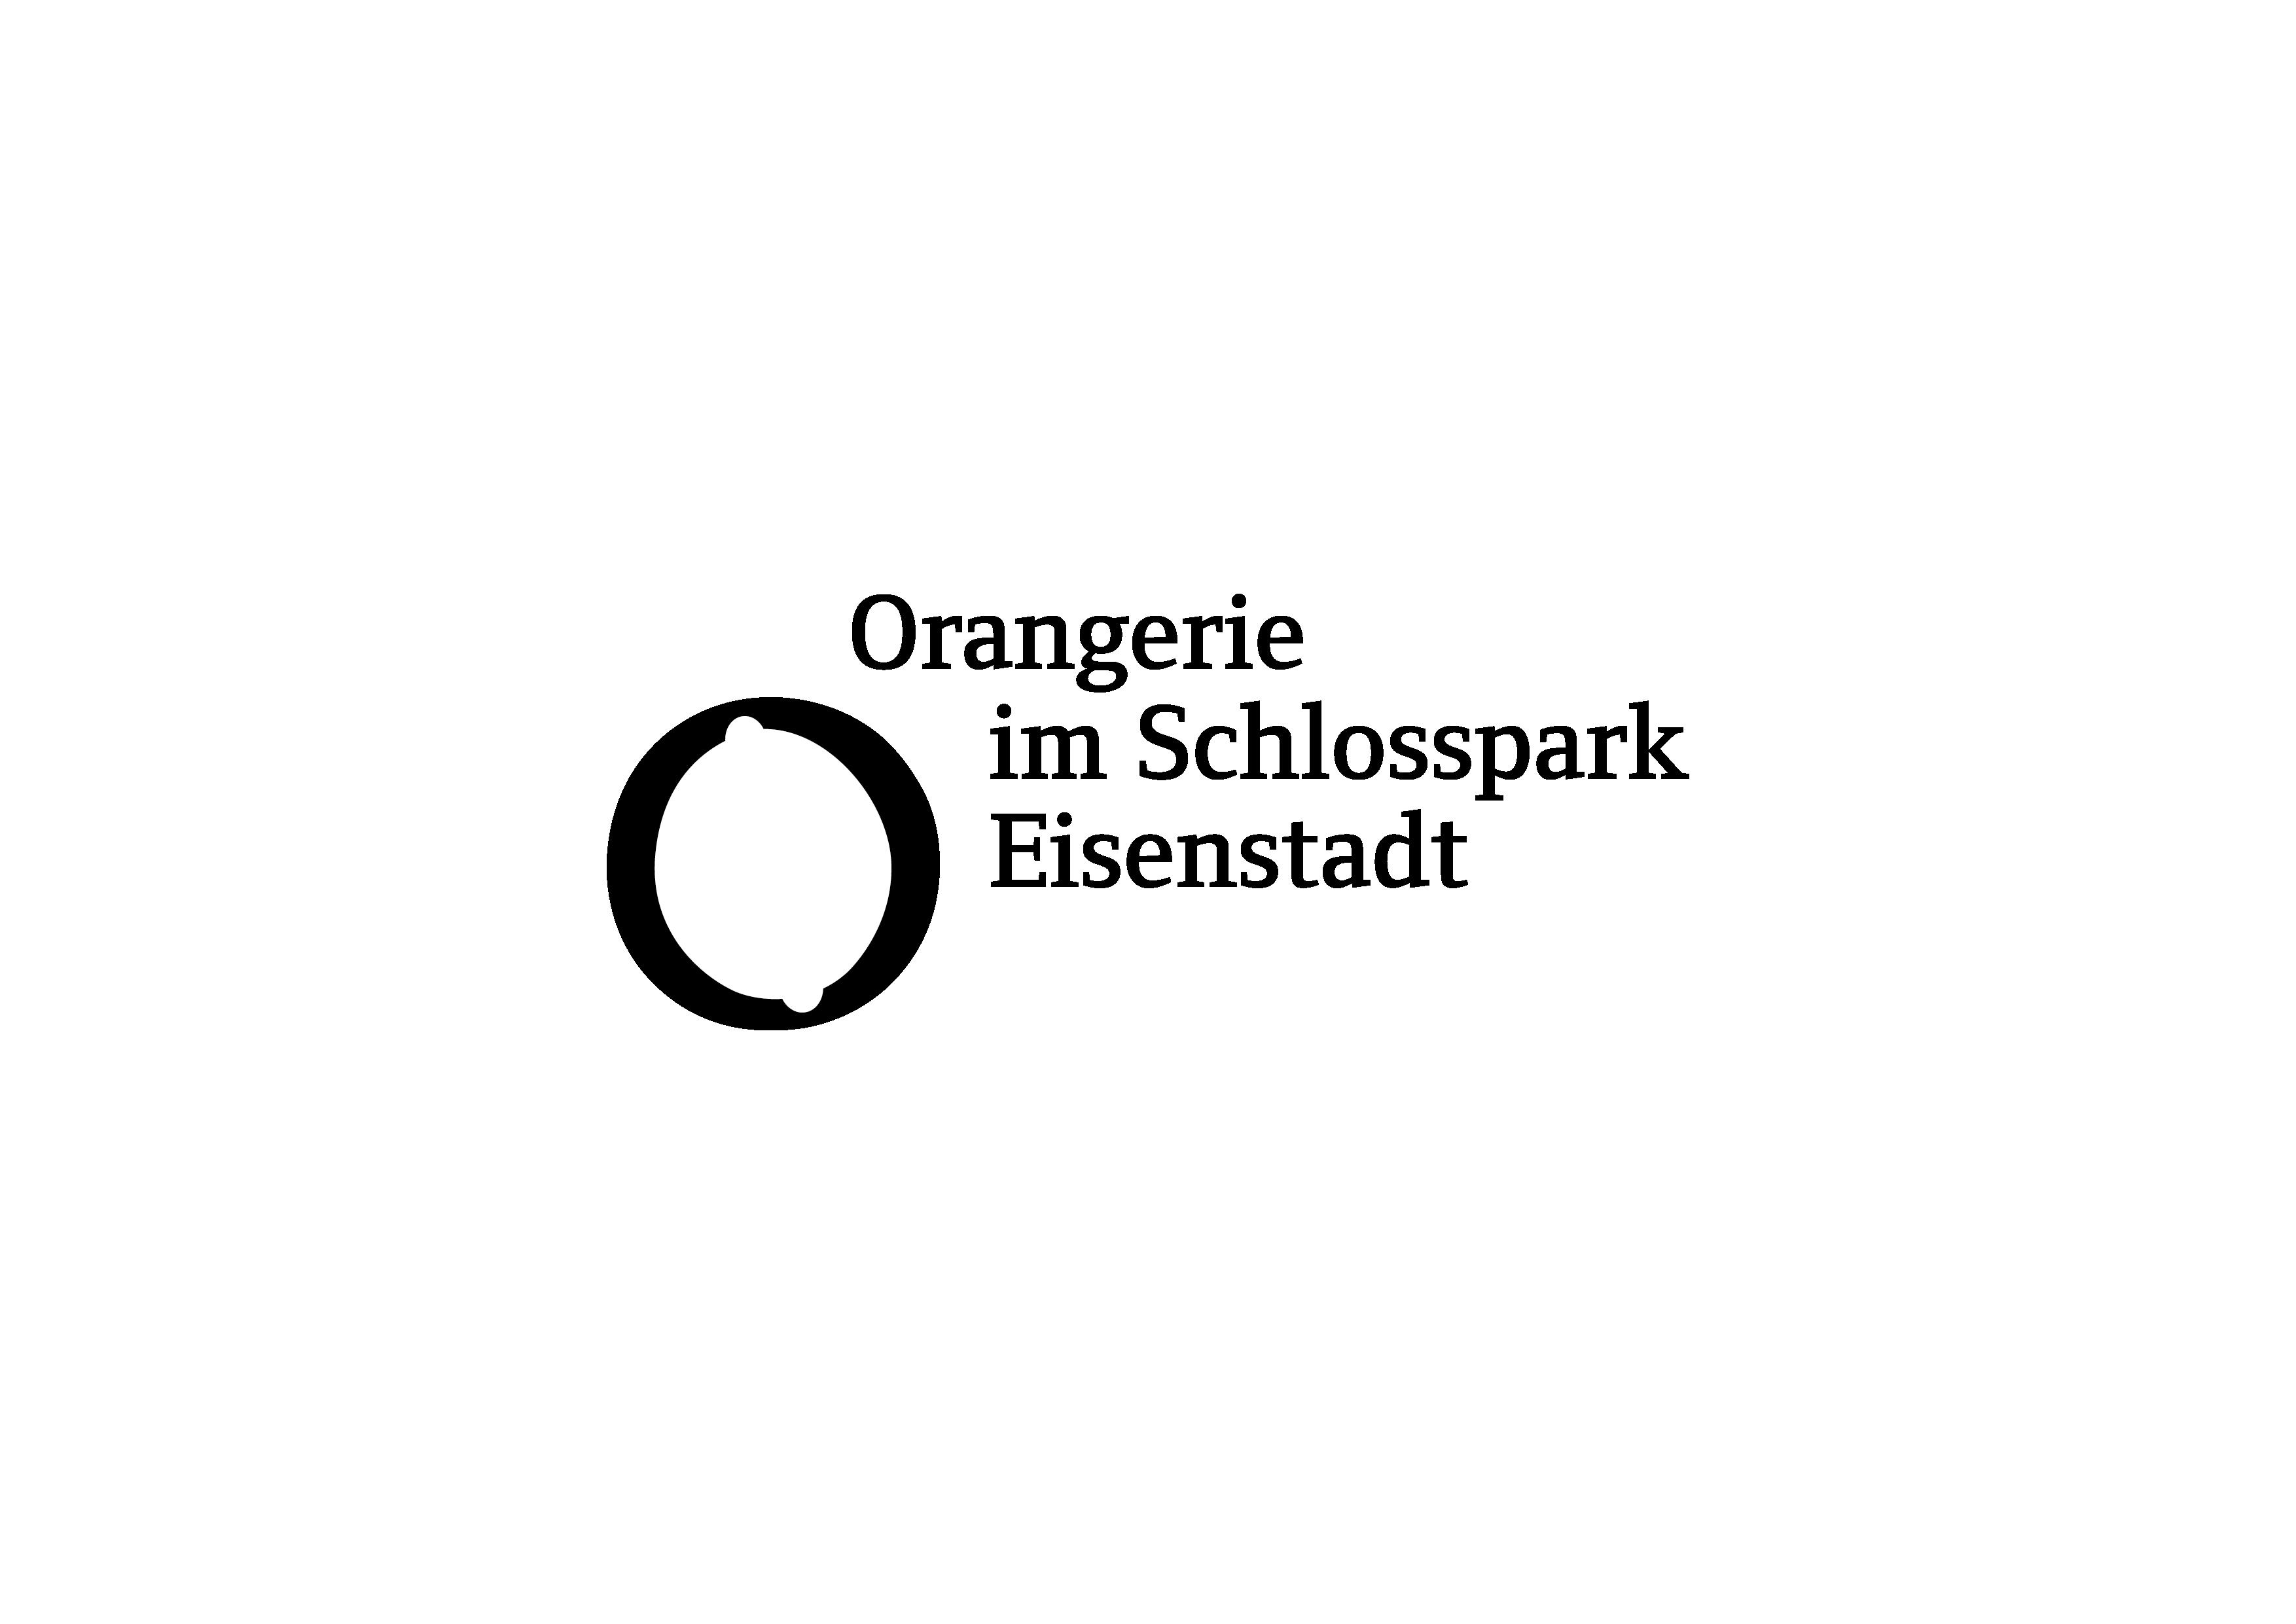 ORANGERIE_LOGO_RZ-01